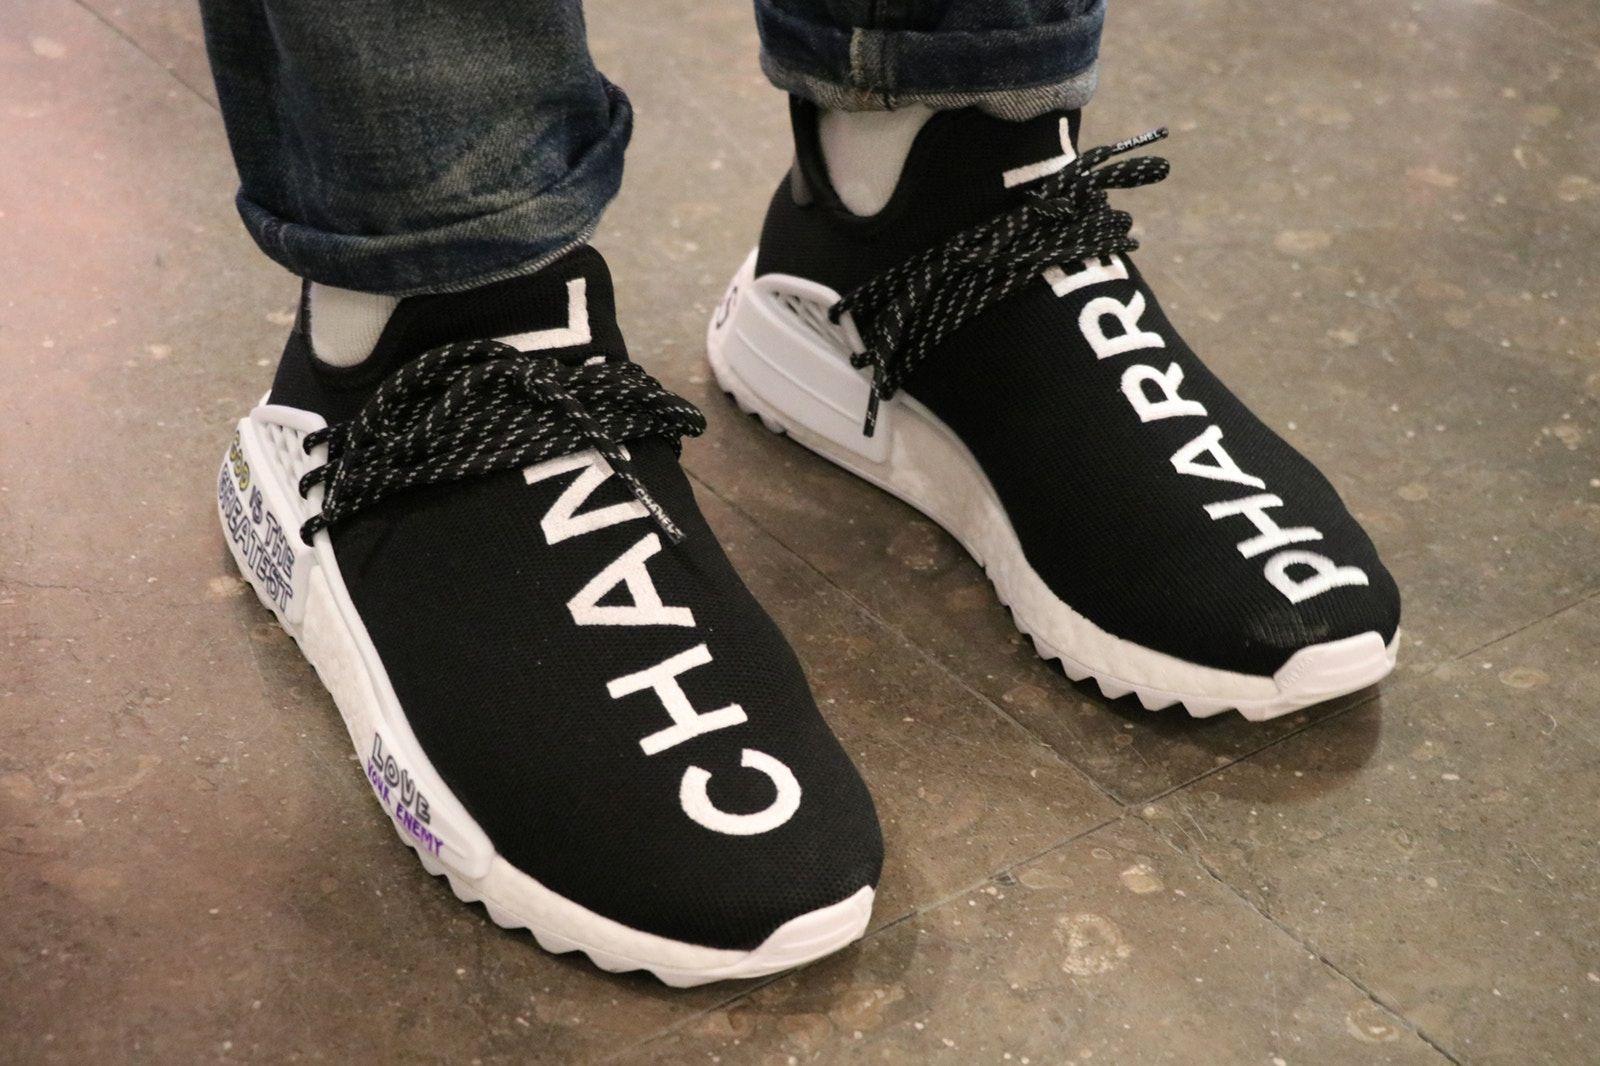 Sneakerando | The Sneakers Online Shop